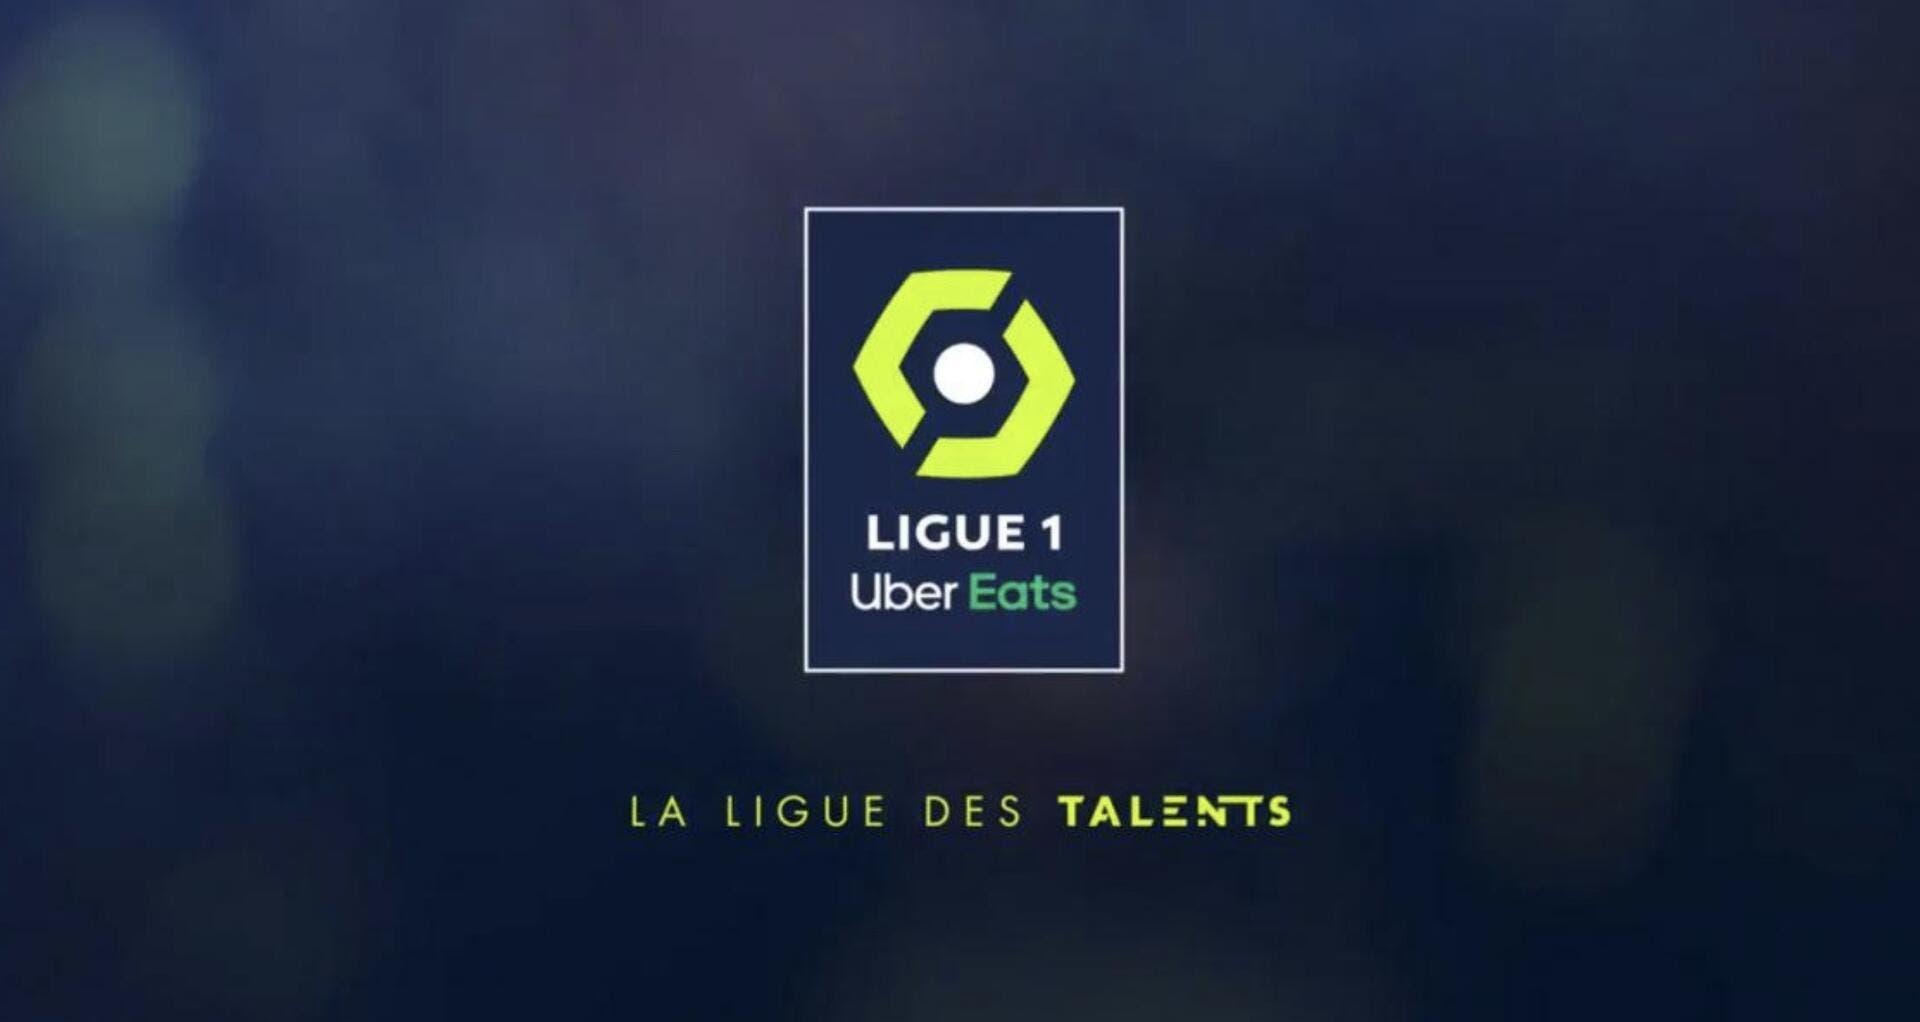 Football Ligue 1 Nimes Lille Les Compos 21h Sur Canal Sport Foot 01